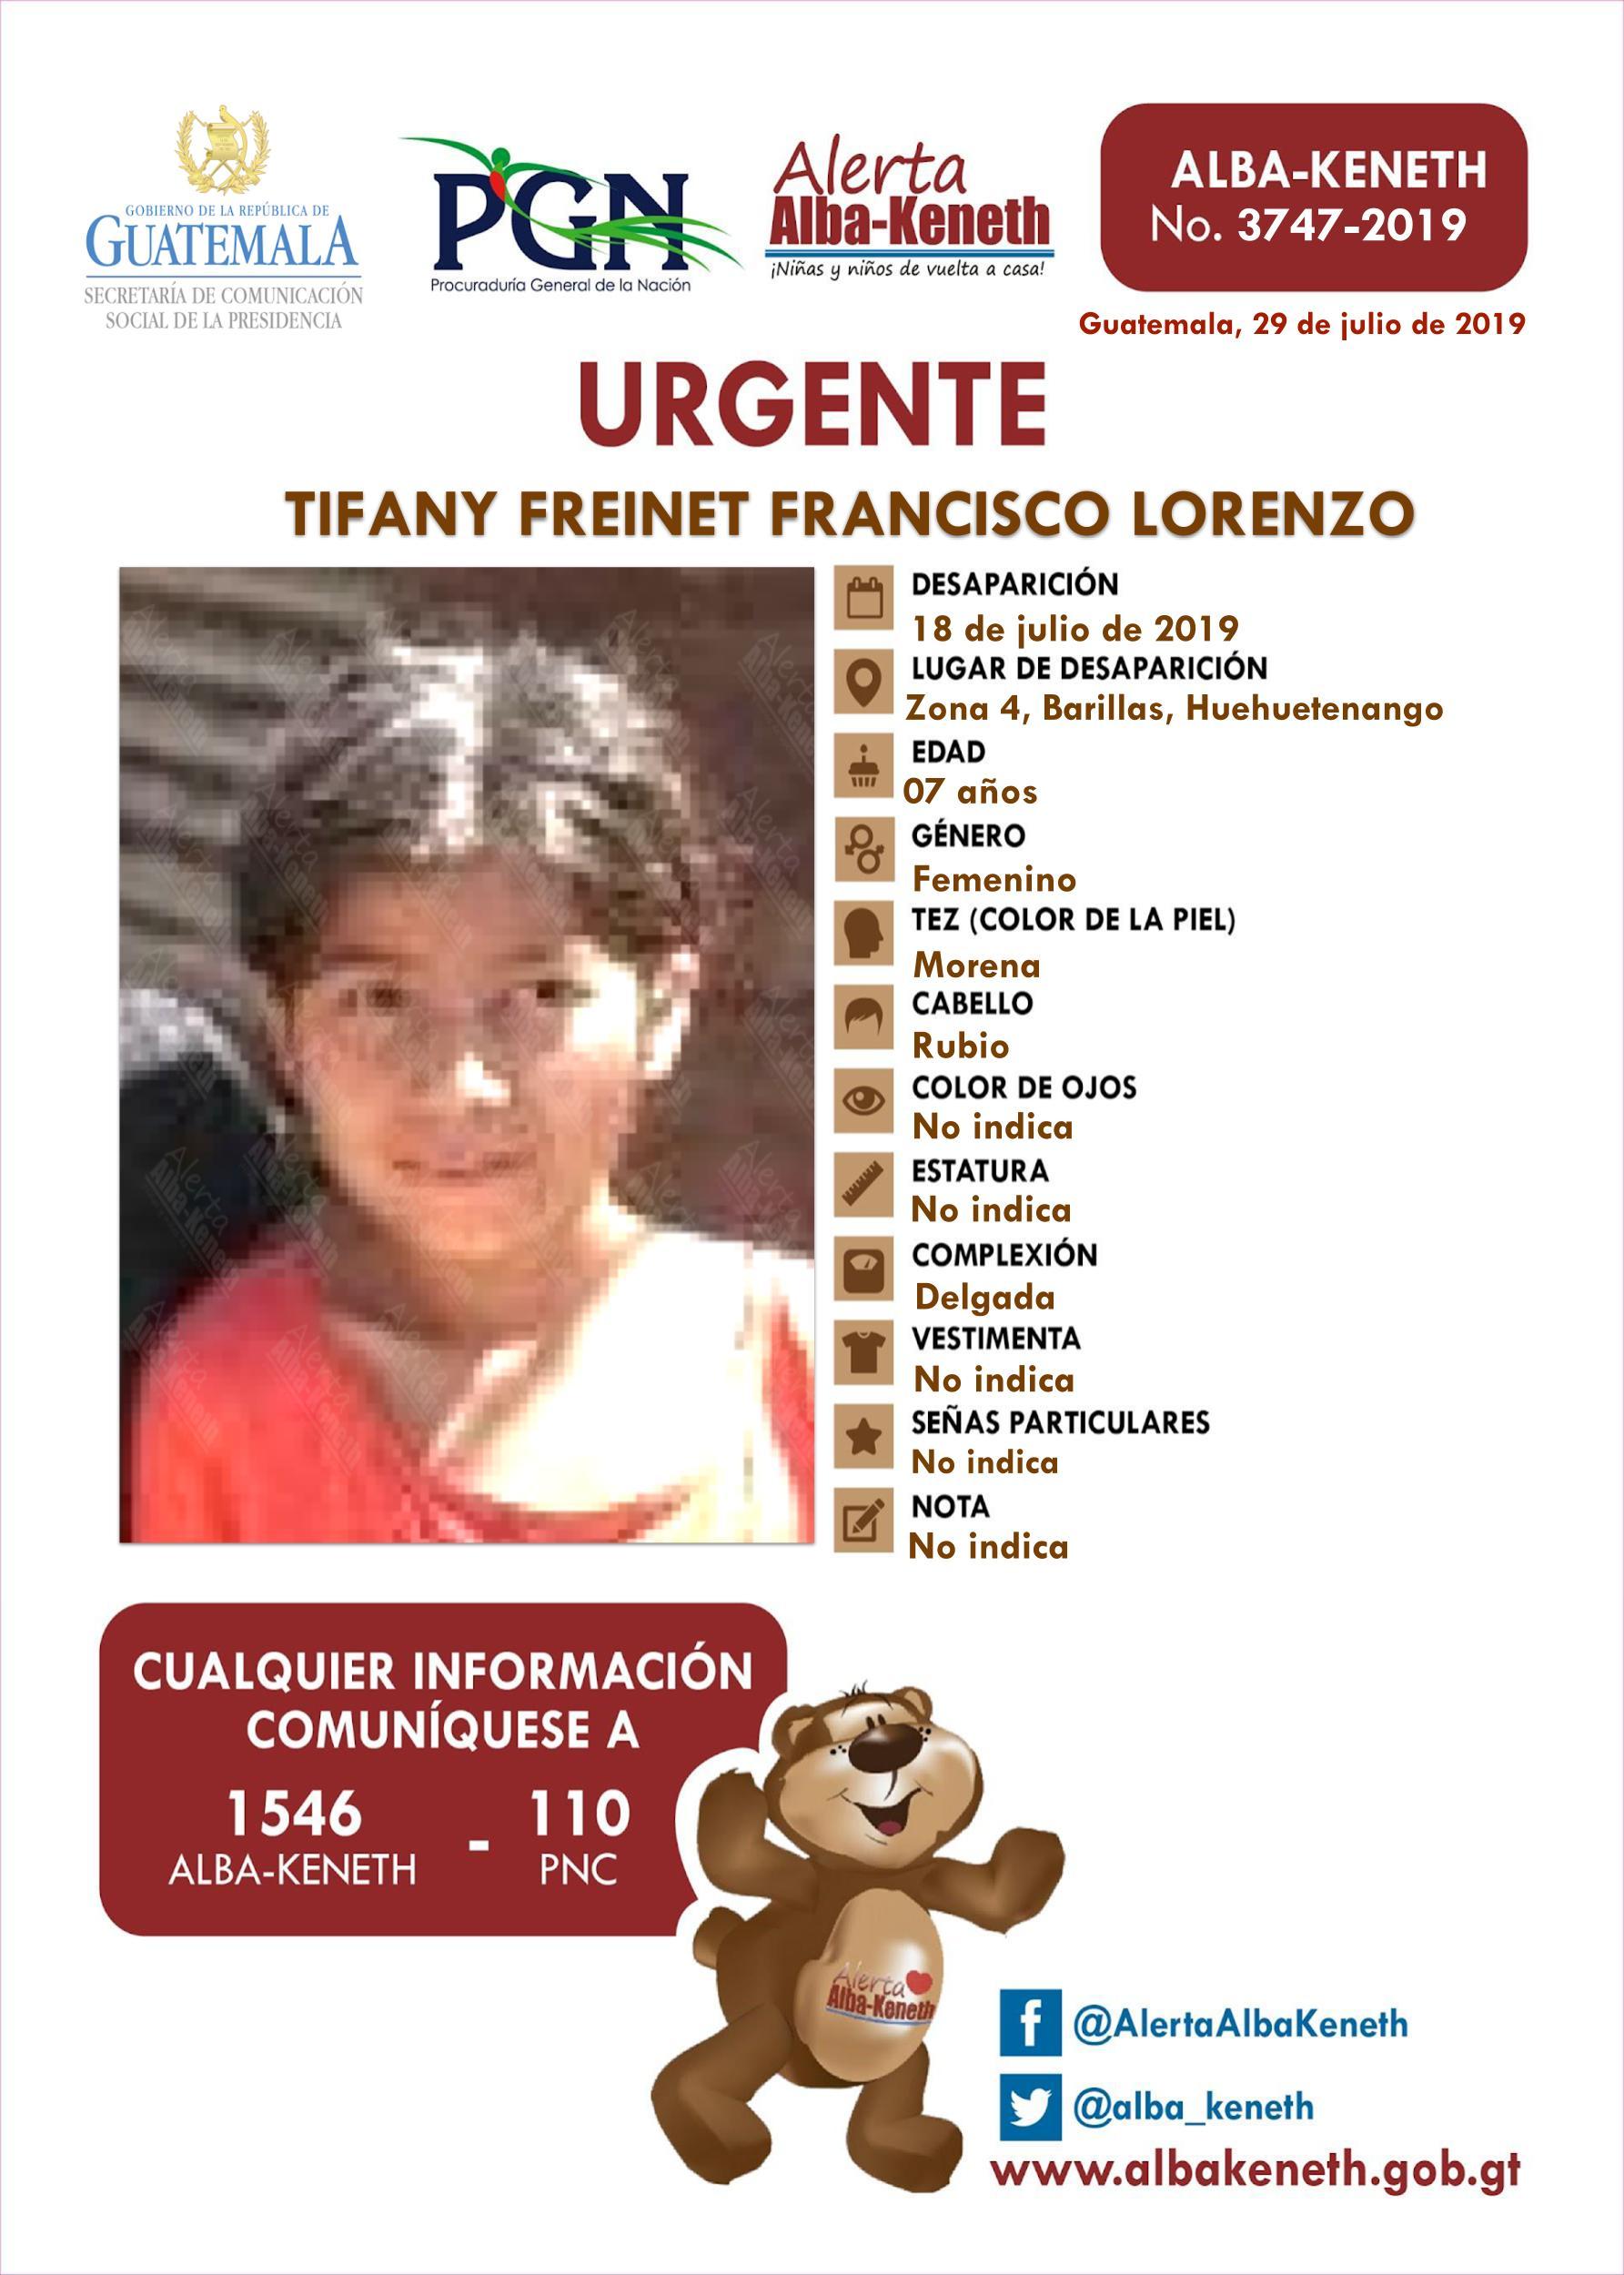 Tifany Freinet Francisco Lorenzo